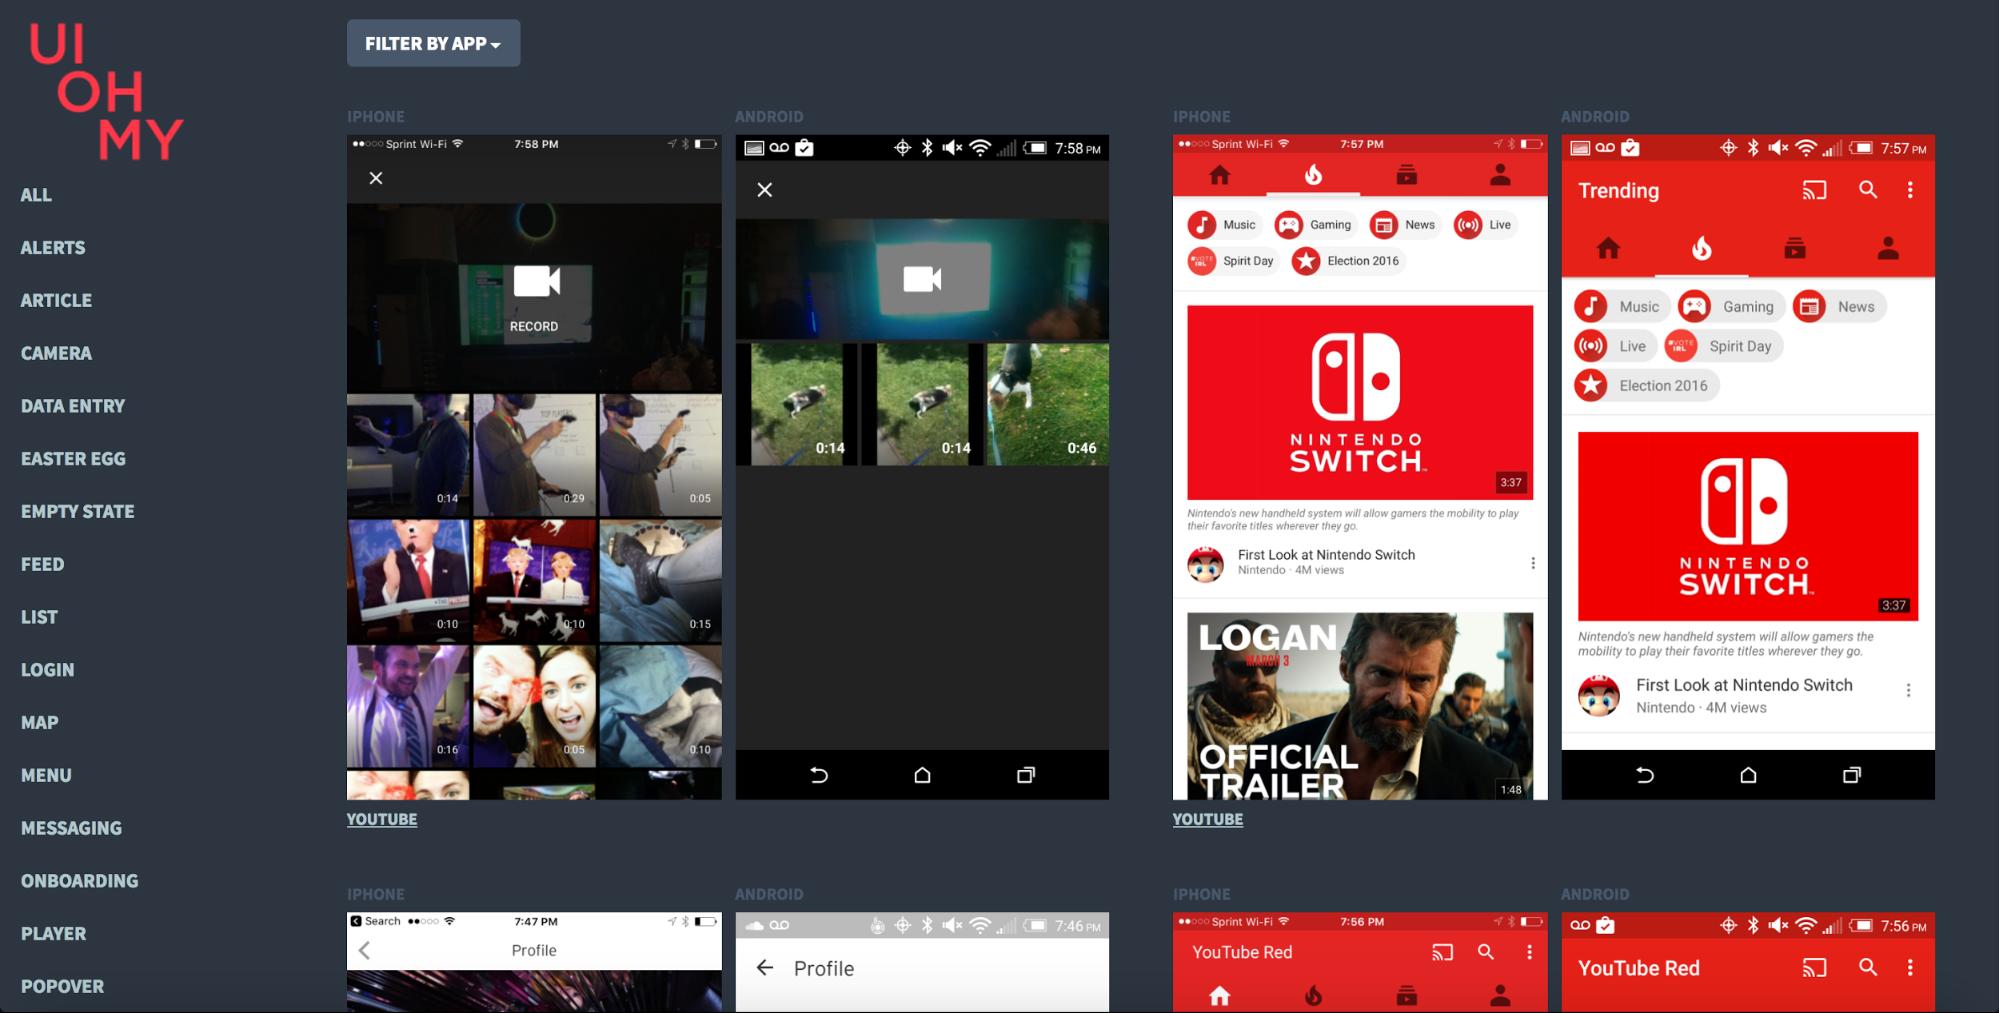 UI OH MY mobile app design site